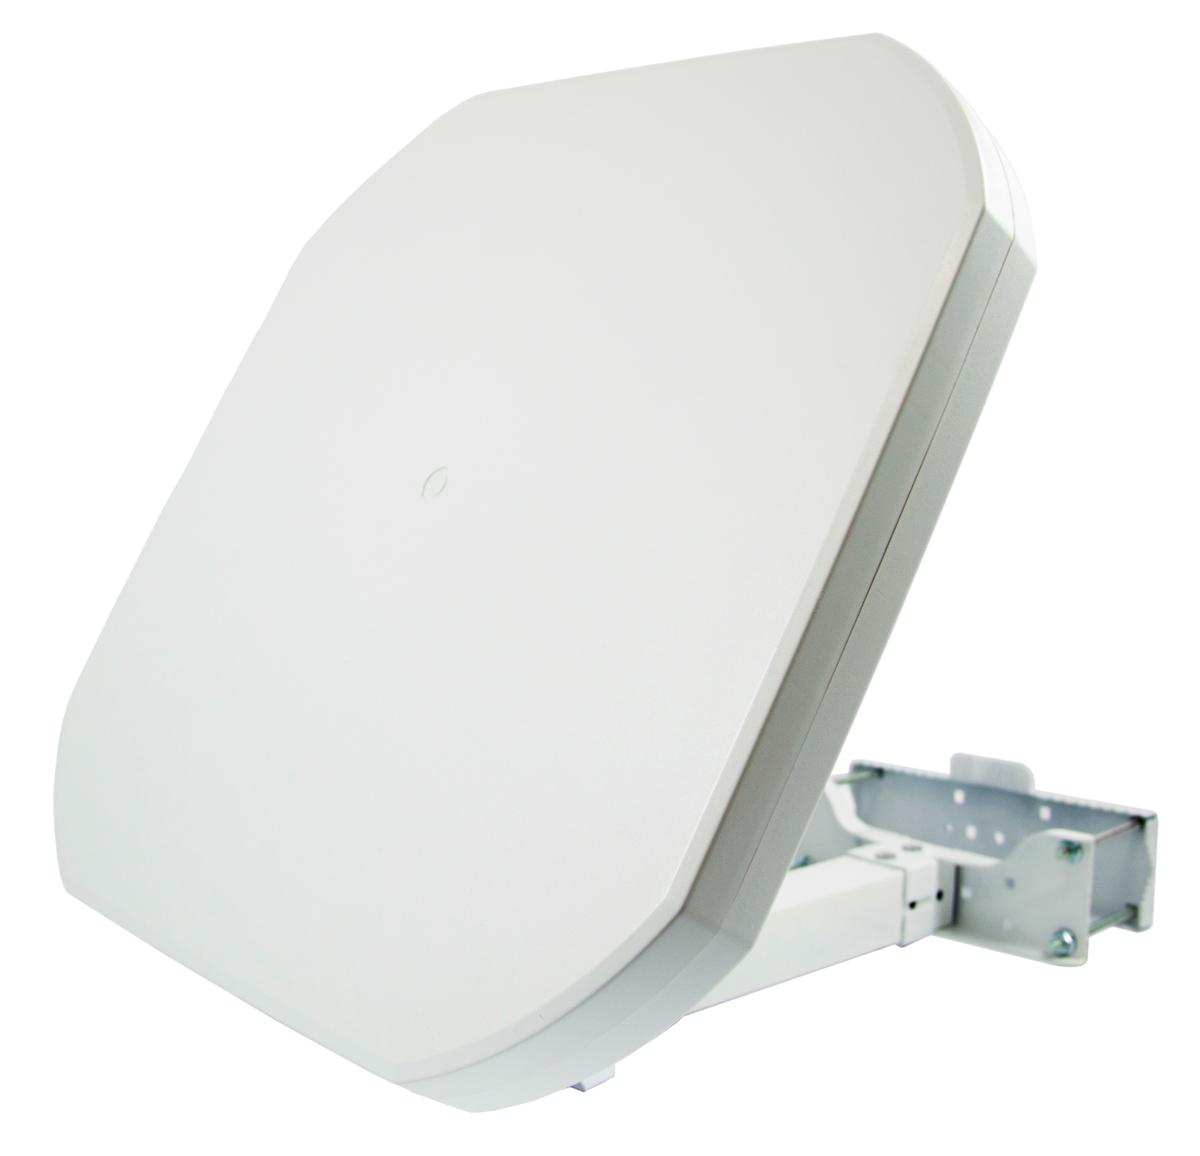 PremiumX FLAT43 Sat Flachantenne mit Digital Twin LNB - Satellitenanlage für 2 Teilnehmer – 4K UHD FullHD HD